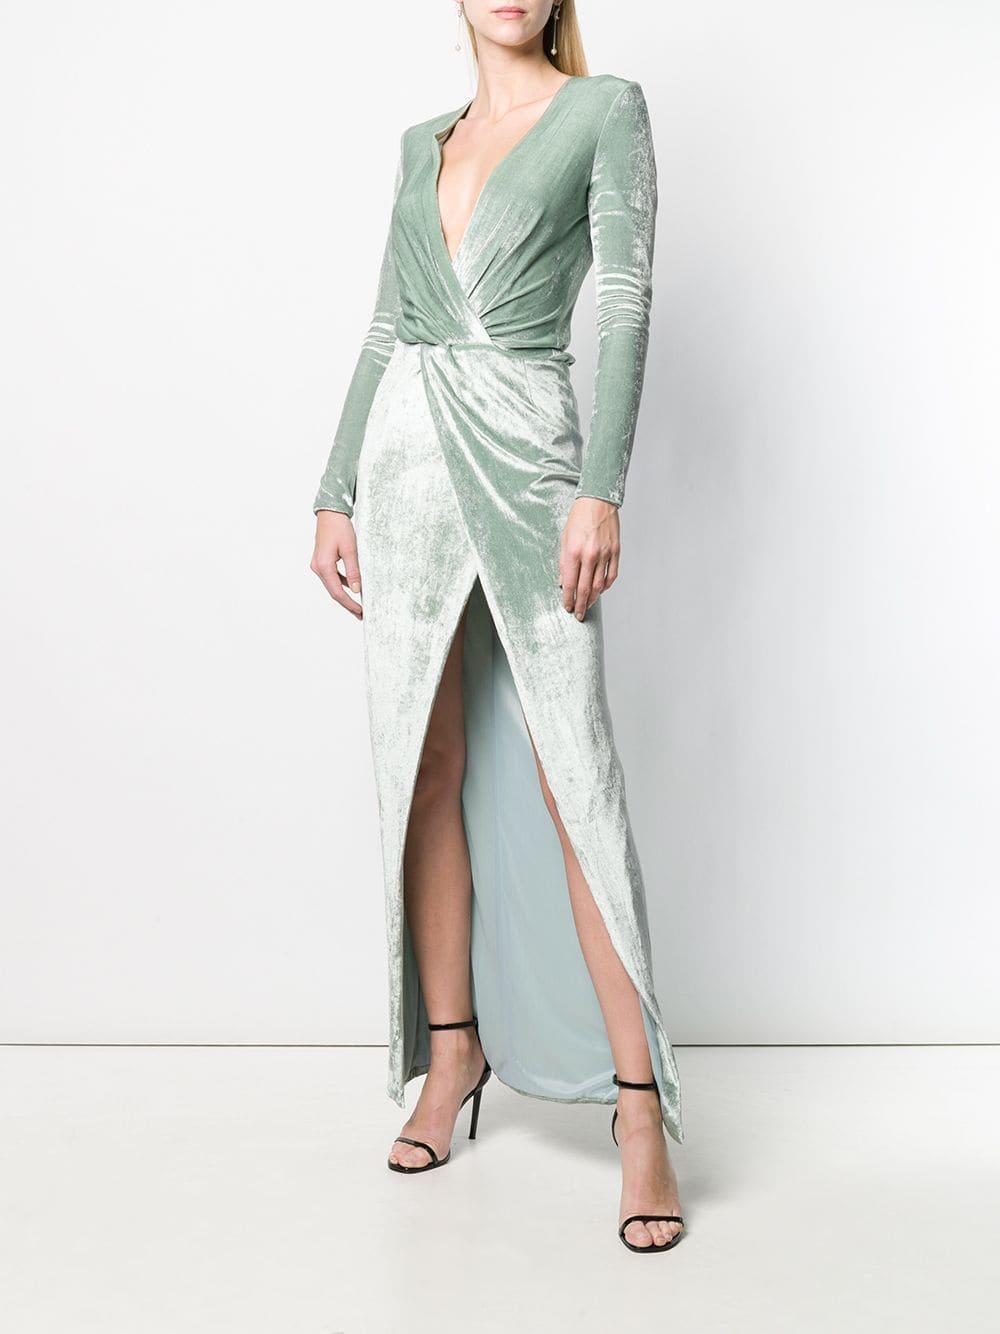 f59eb0f4a320 Galvan London Vera Velvet Dress in Green - Lyst